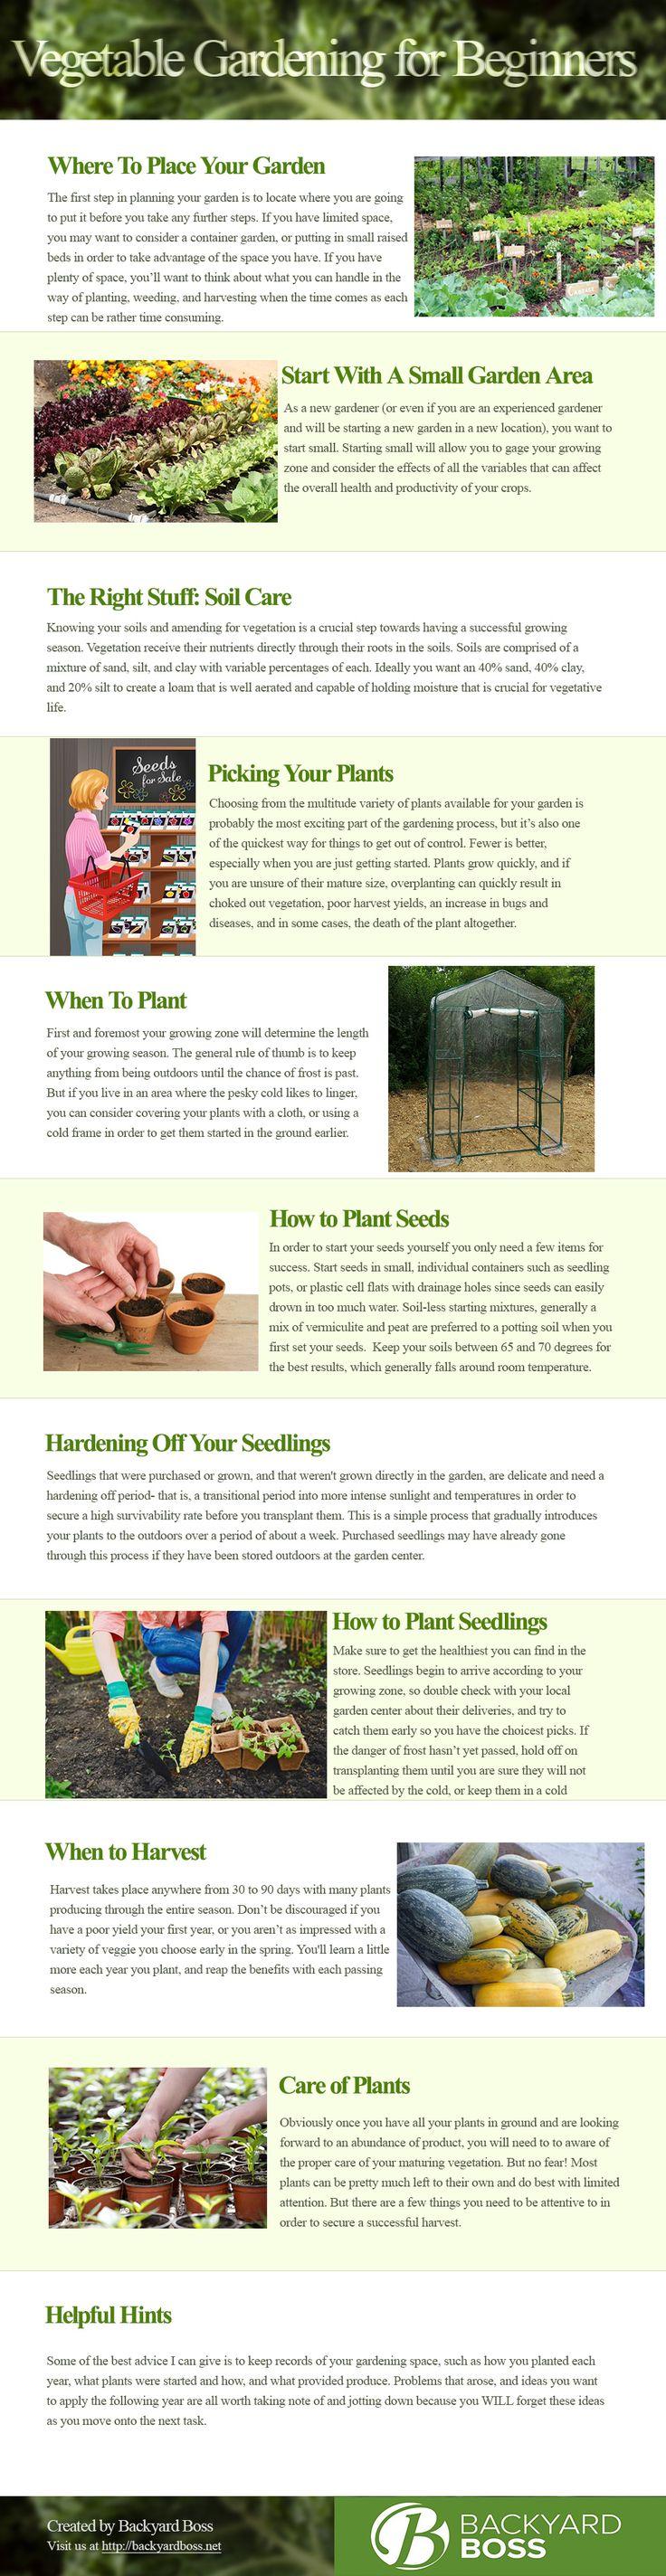 260 best gardening tips for beginners images on pinterest - Gardening for beginners ...